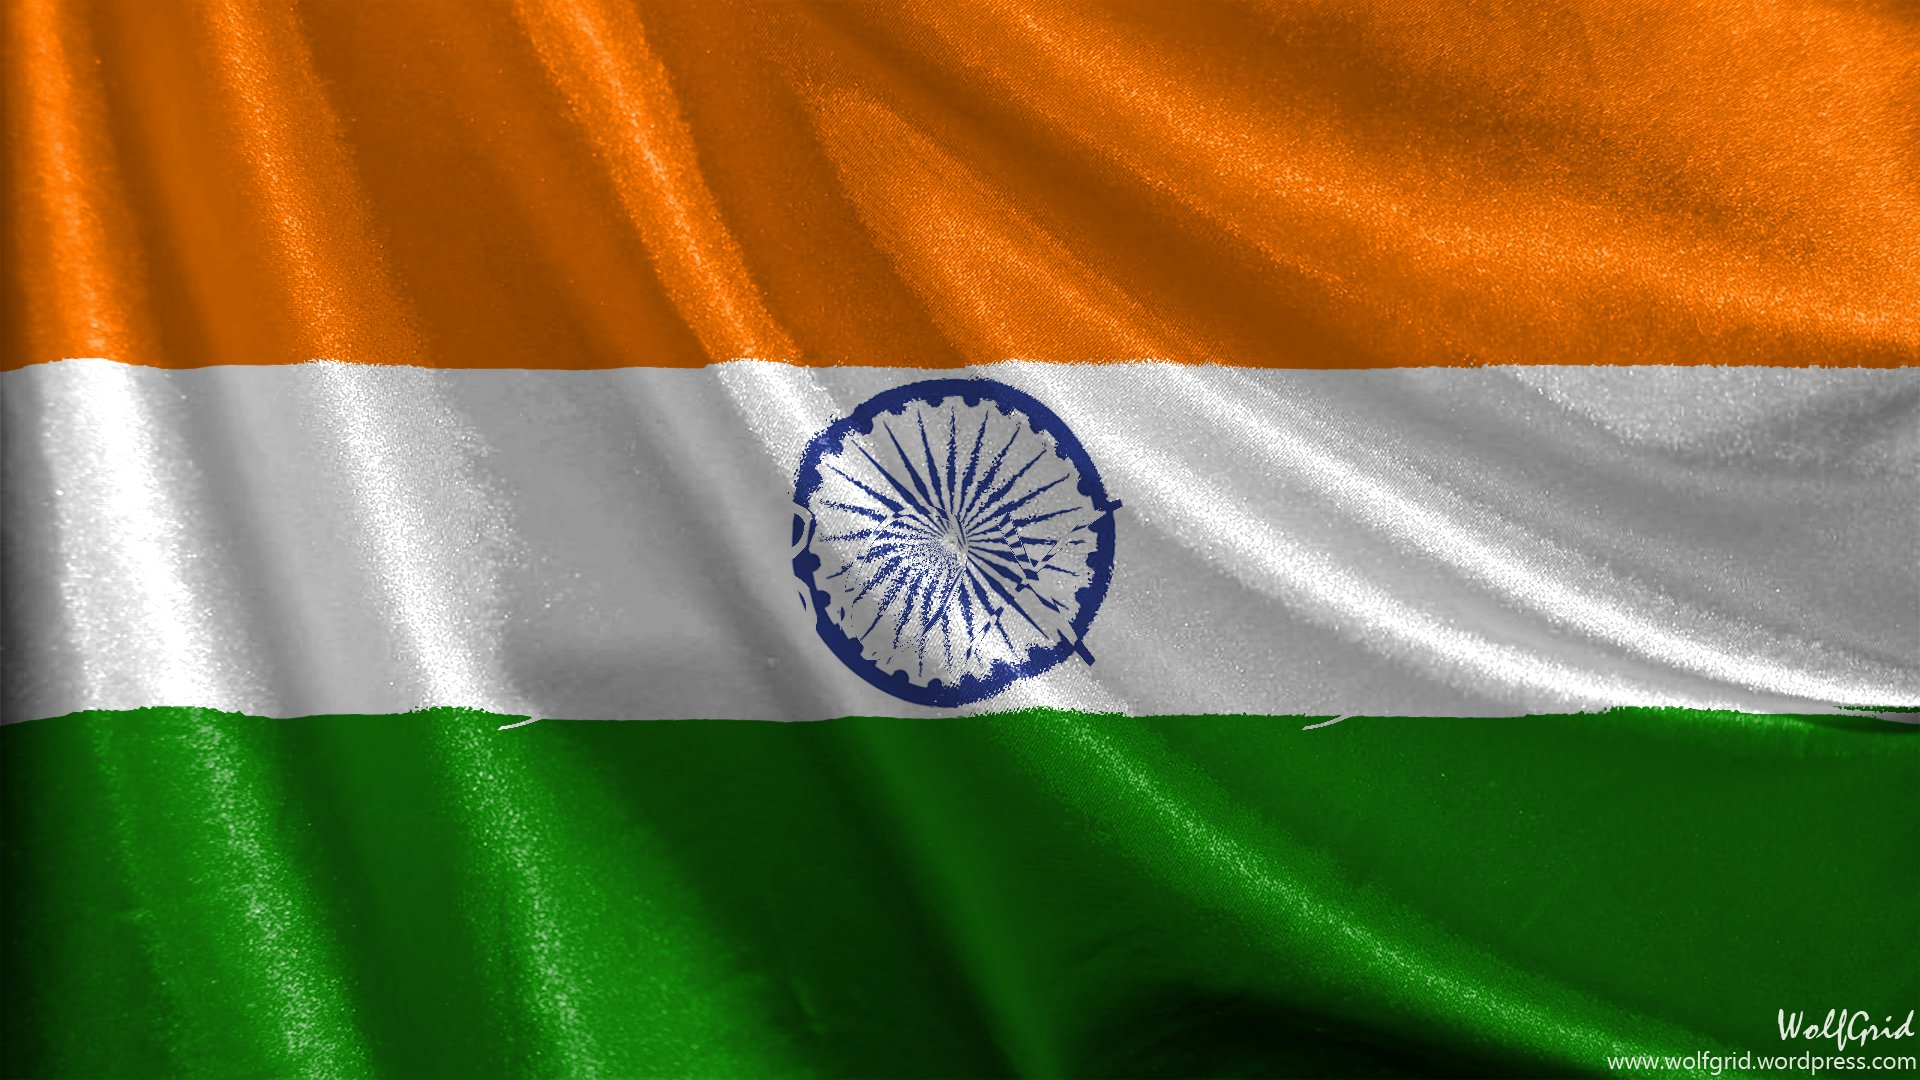 India Flag Hd 1920 1080: India Flag HD Wallpaper